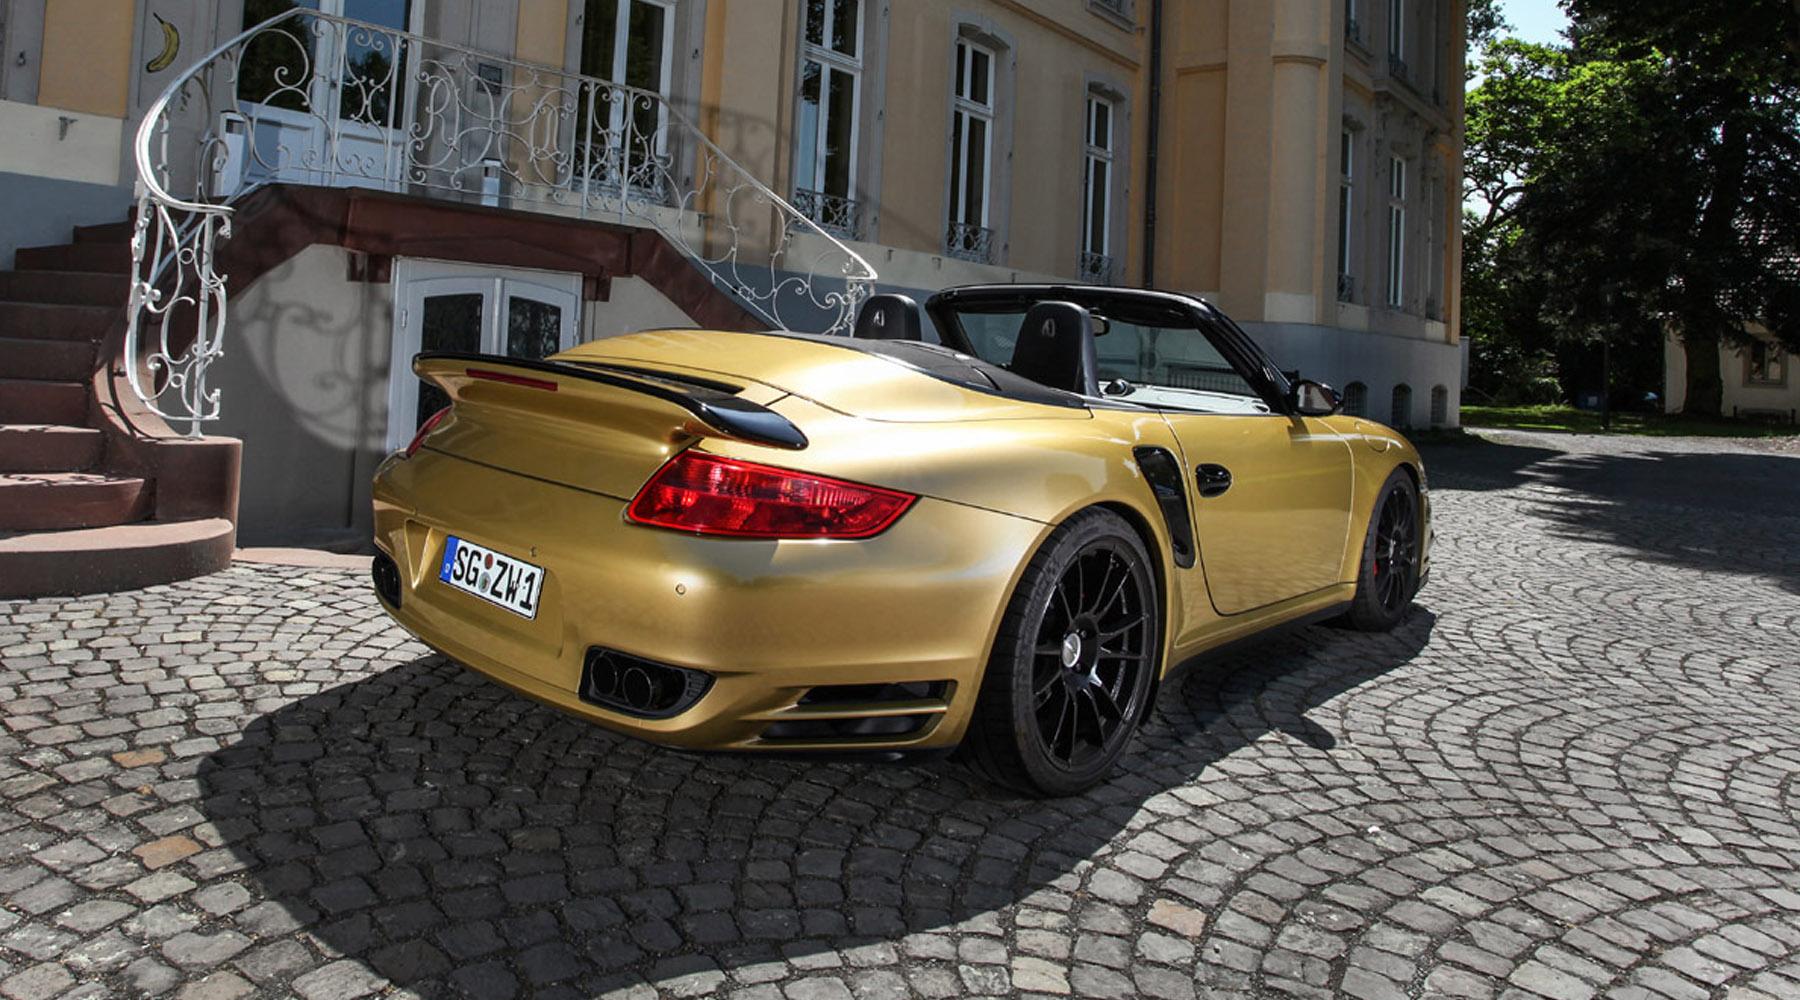 Wimmer Porsche Turbo Cabrio 911